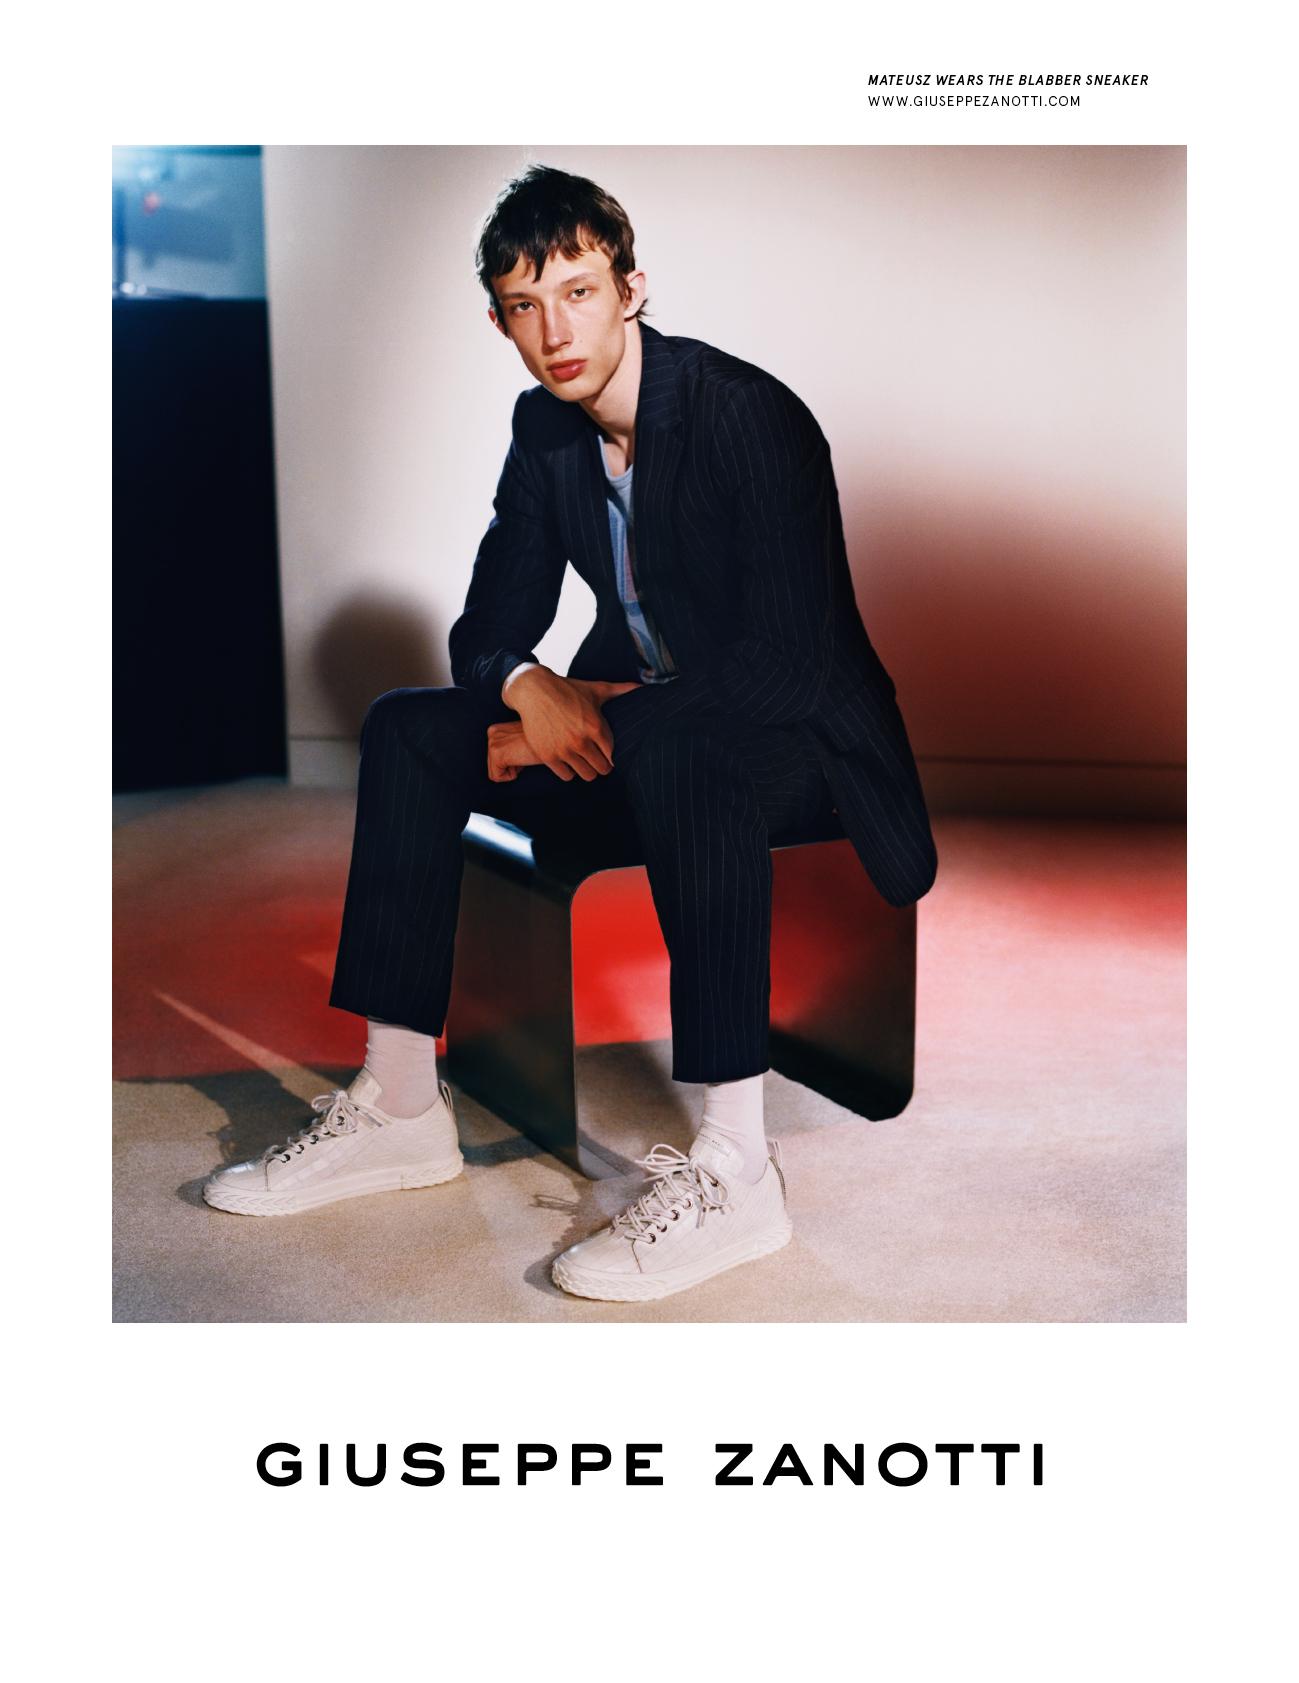 giuseppe_zanotti_fall_2019_campaign2.jpg